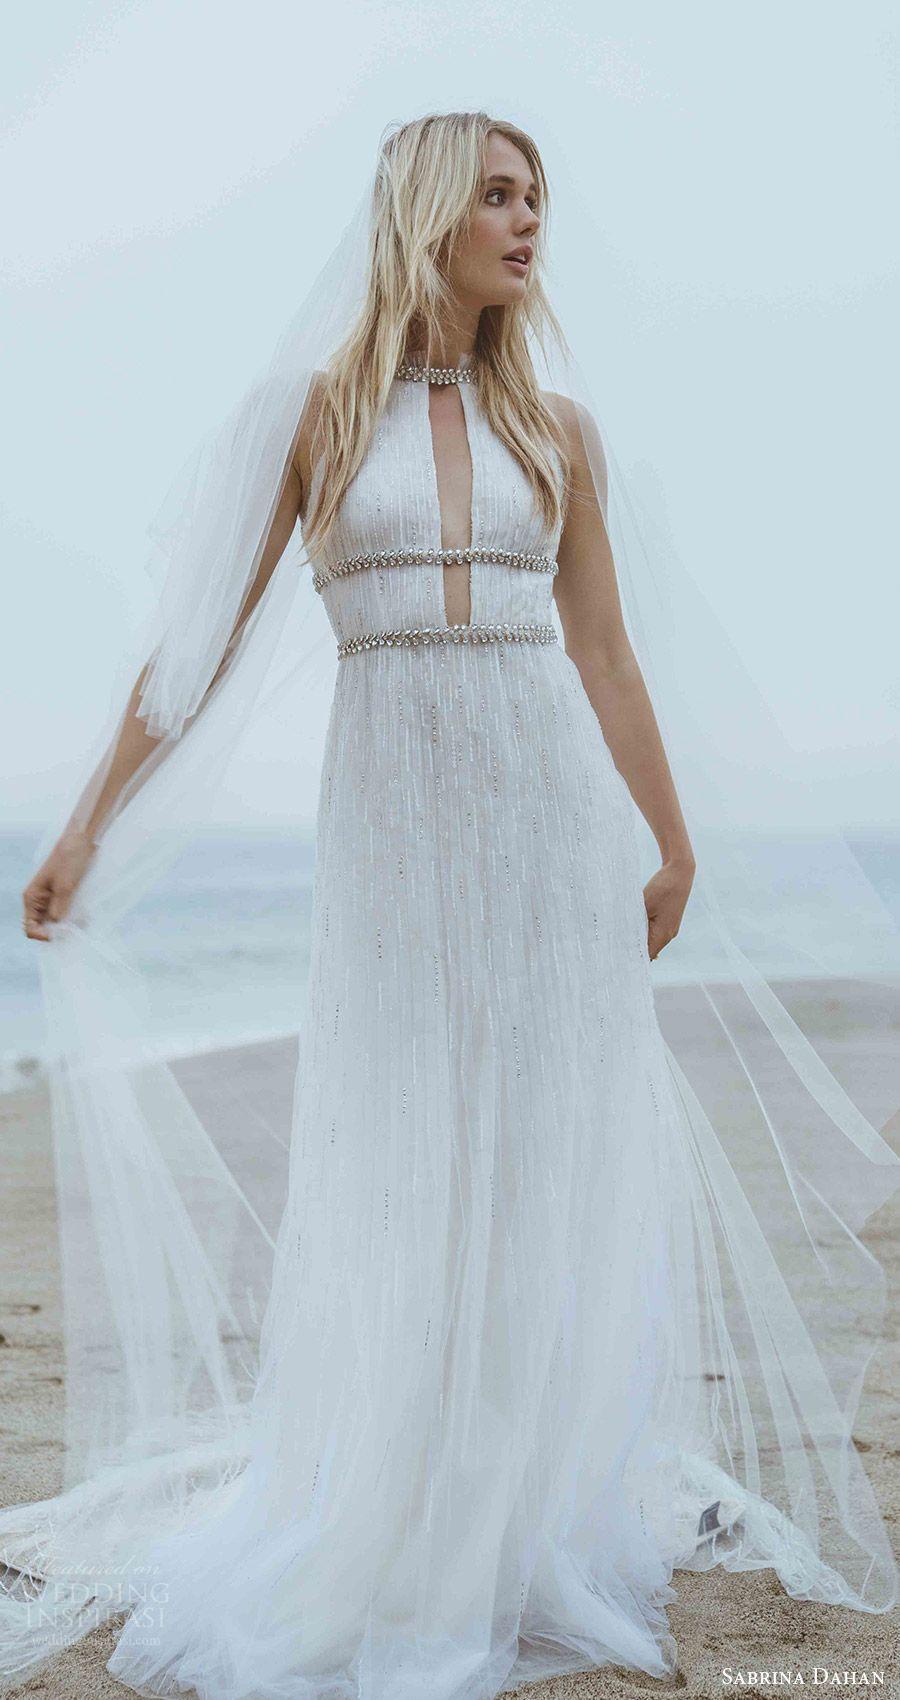 Sabrina Dahan Spring 2018 Wedding Dresses   Wedding dress, Spring ...